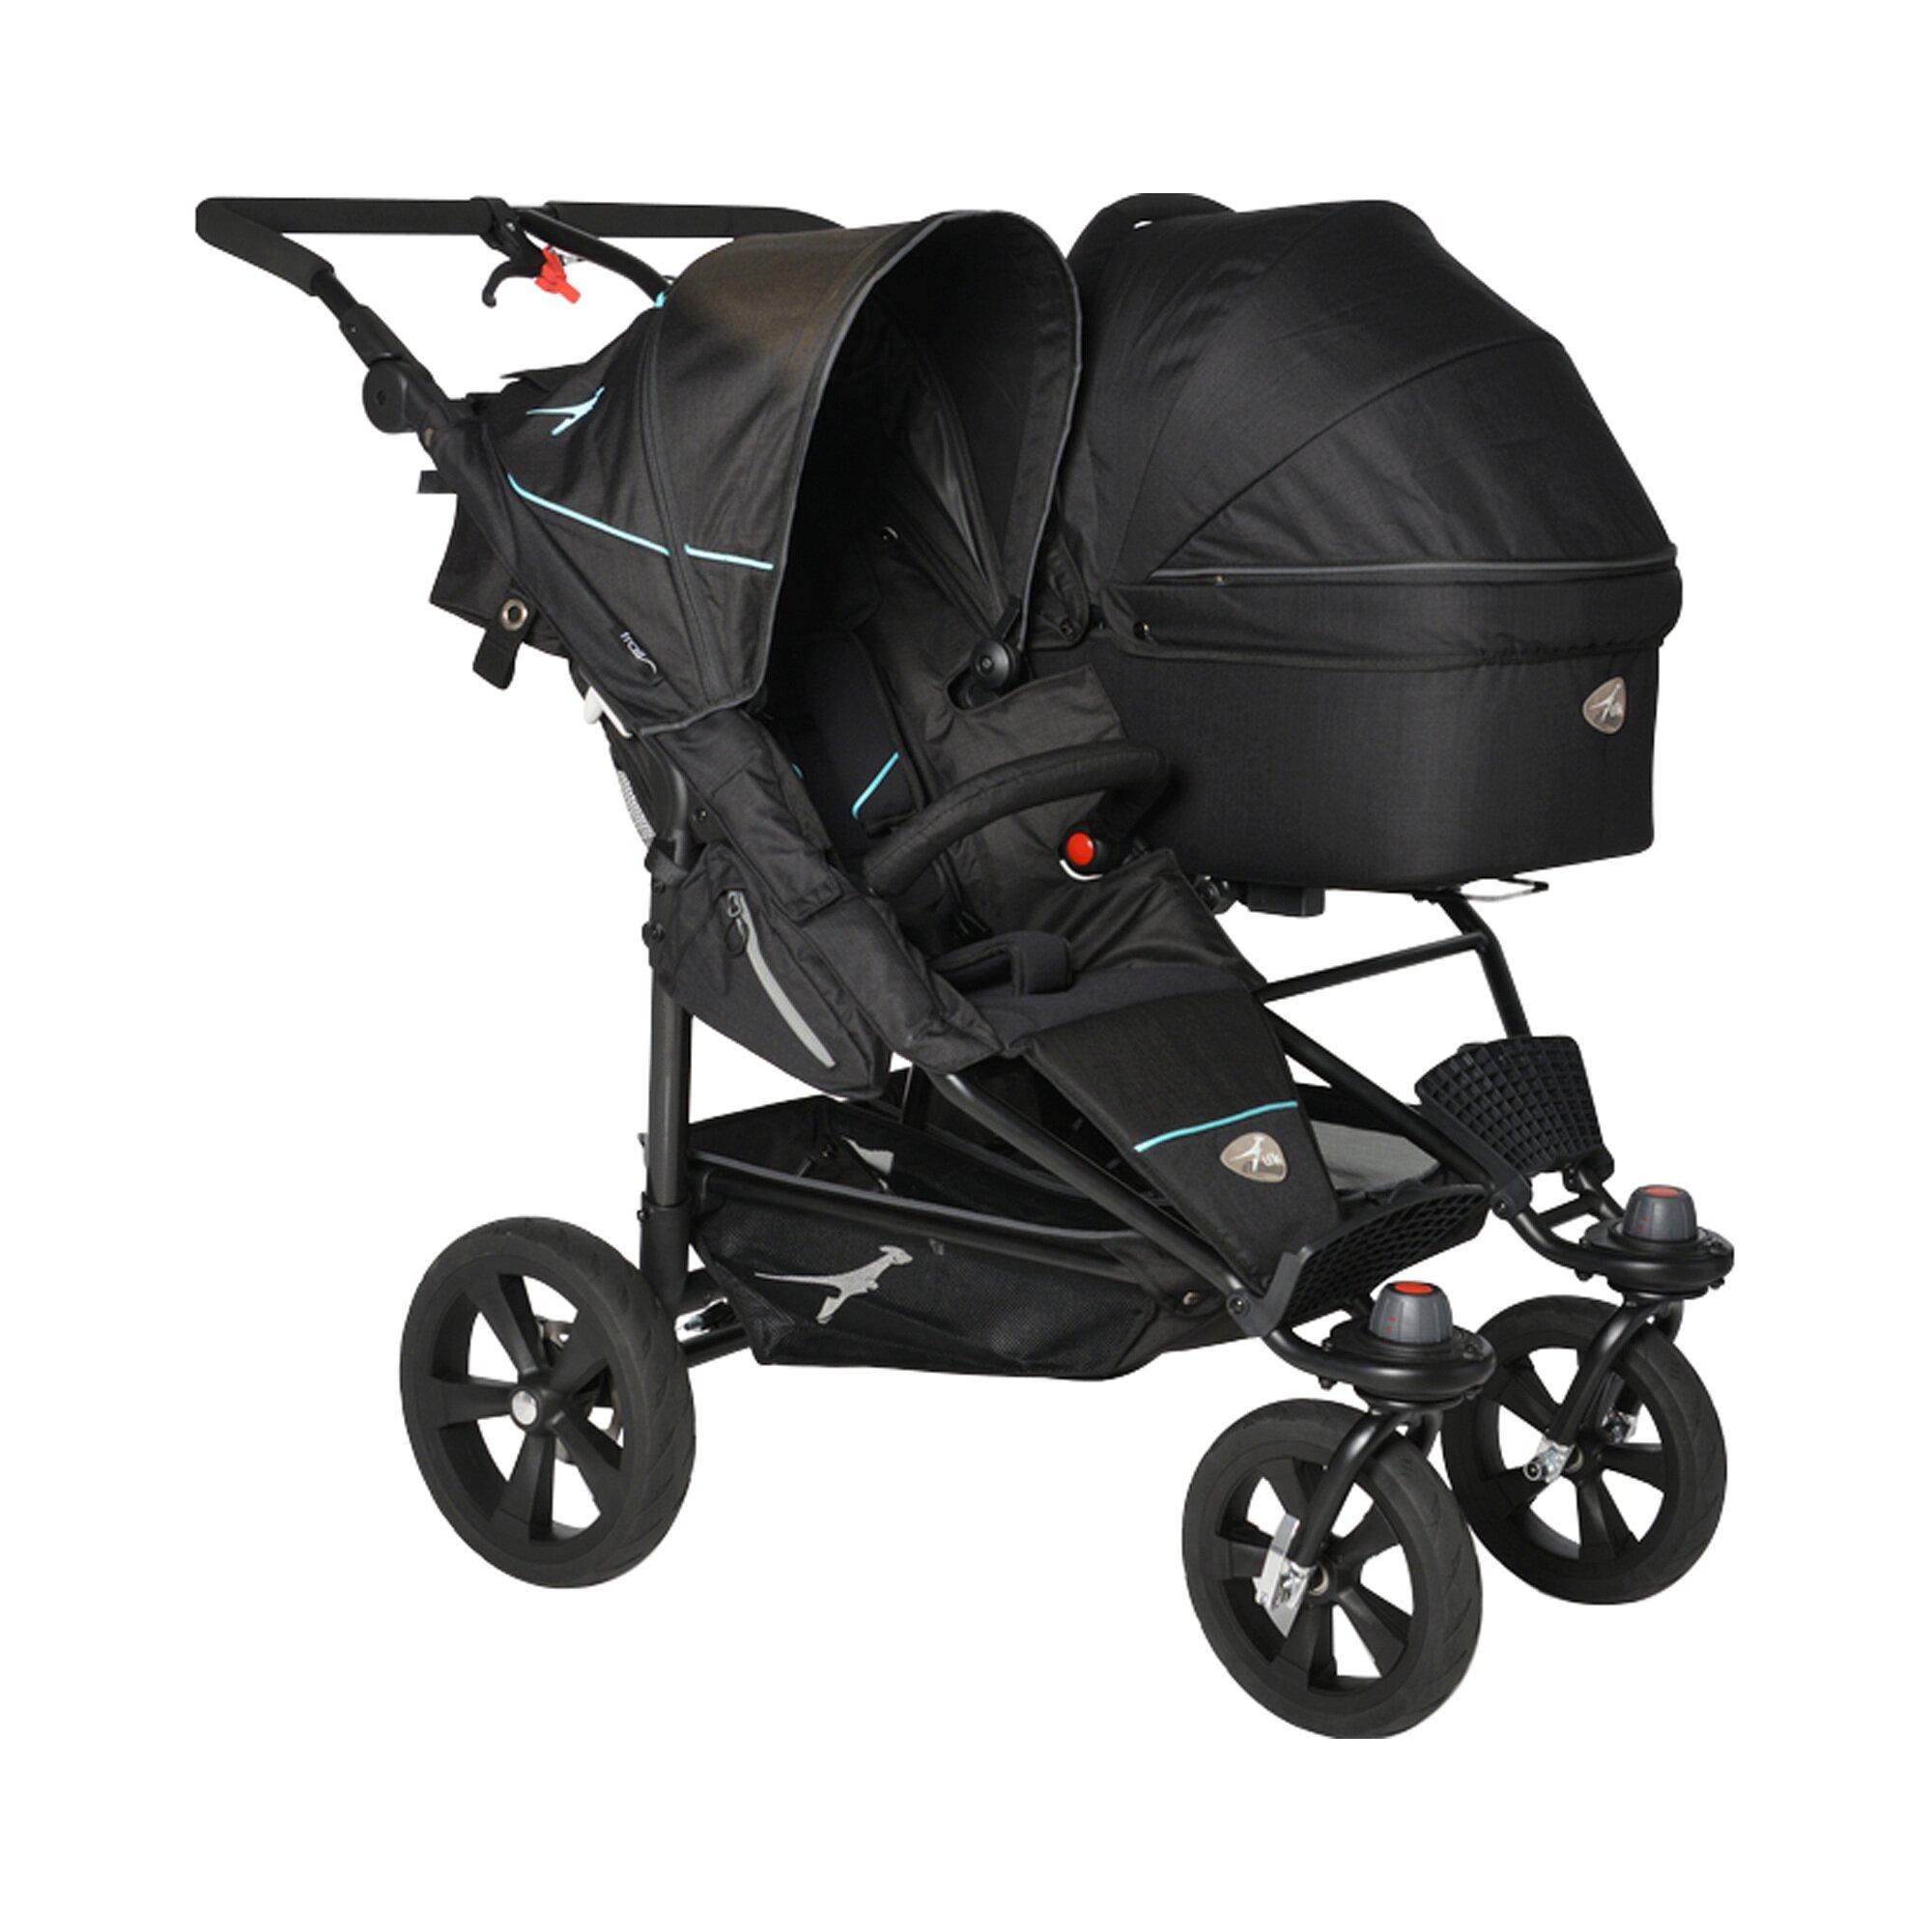 tfk-twin-trail-kinderwagen-zwillingswagen-mehrfarbig